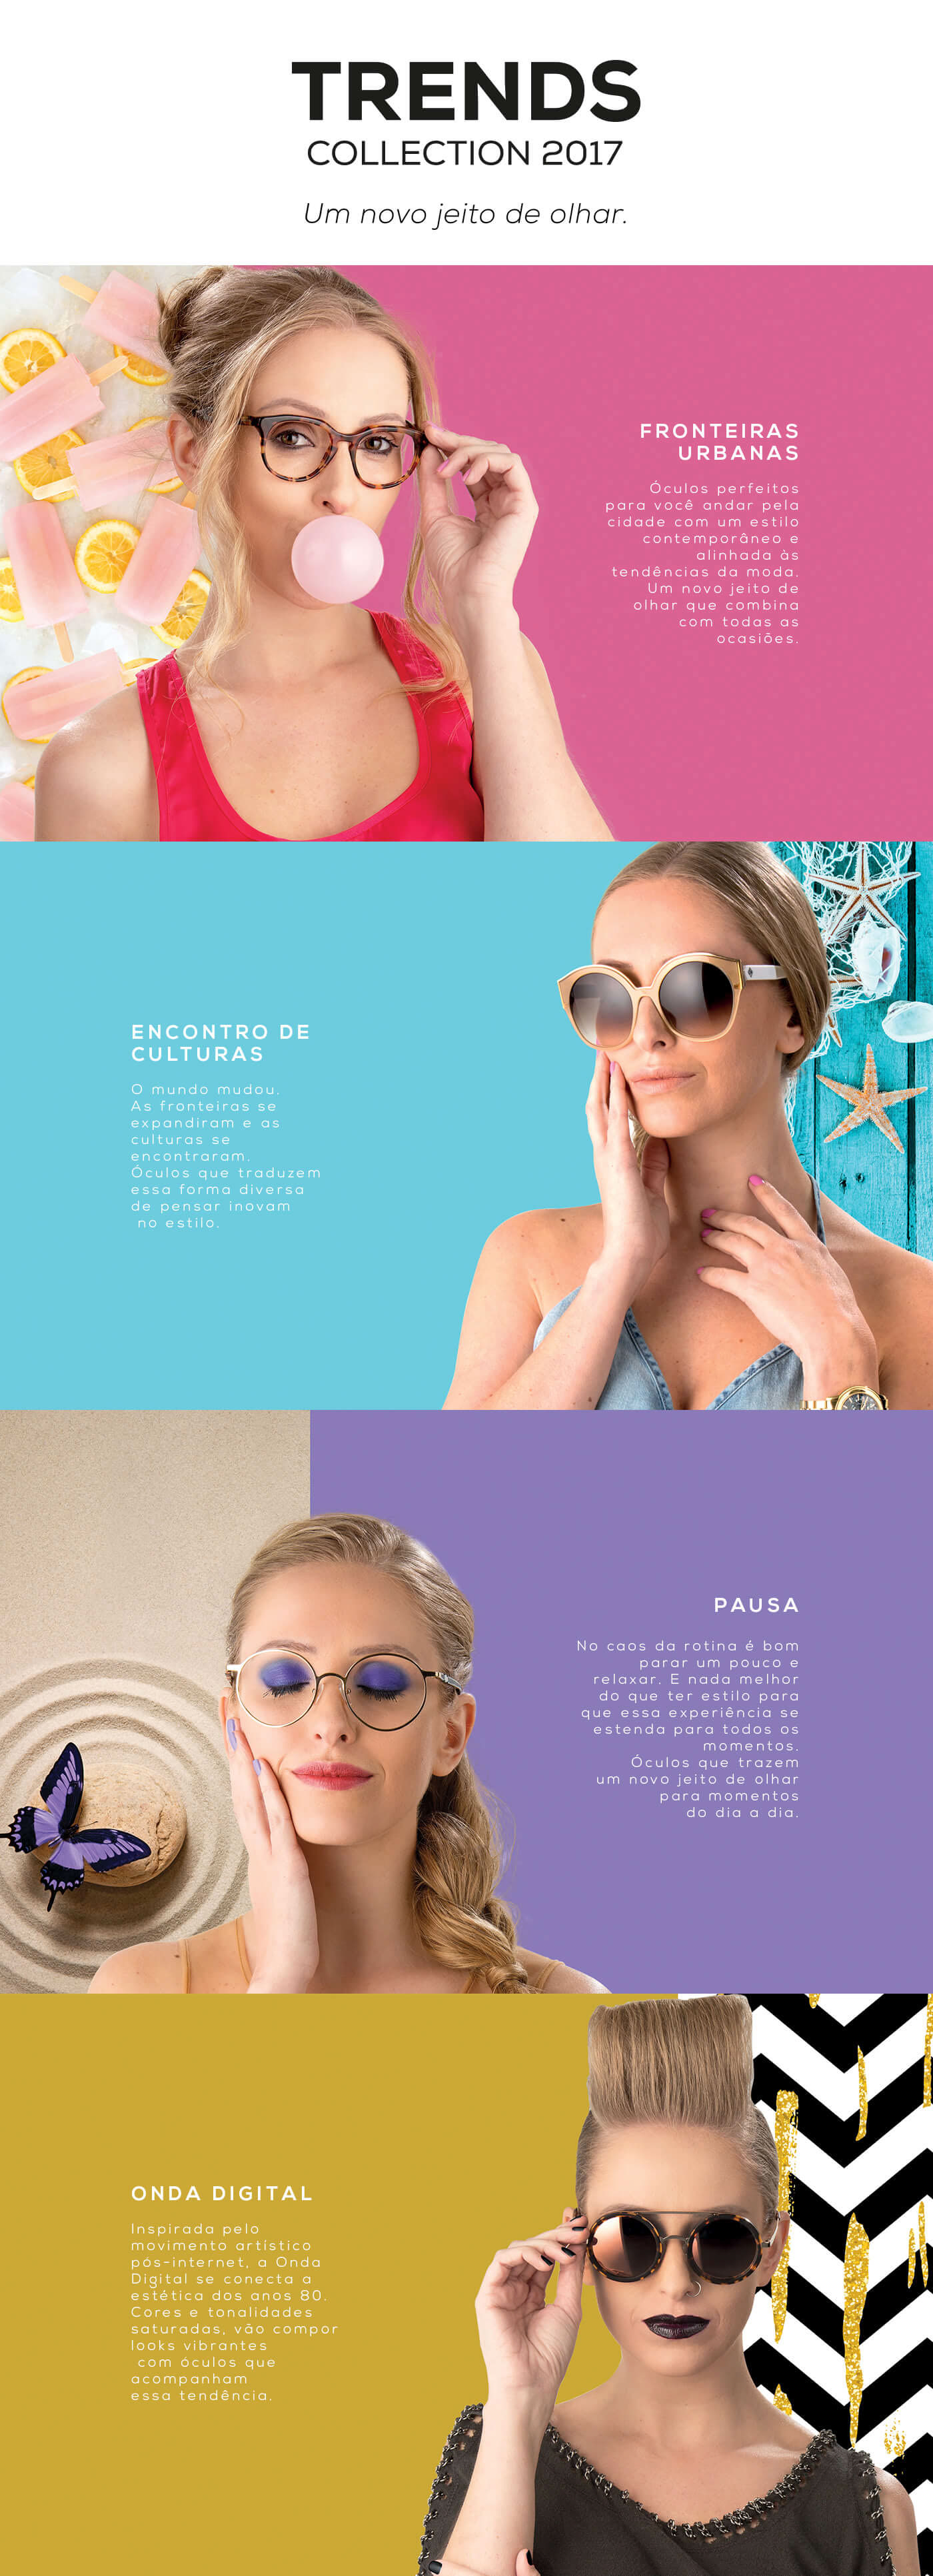 glasses optics vízia óptica vízia branding  rebranding campaign glass trends 2017 trends design